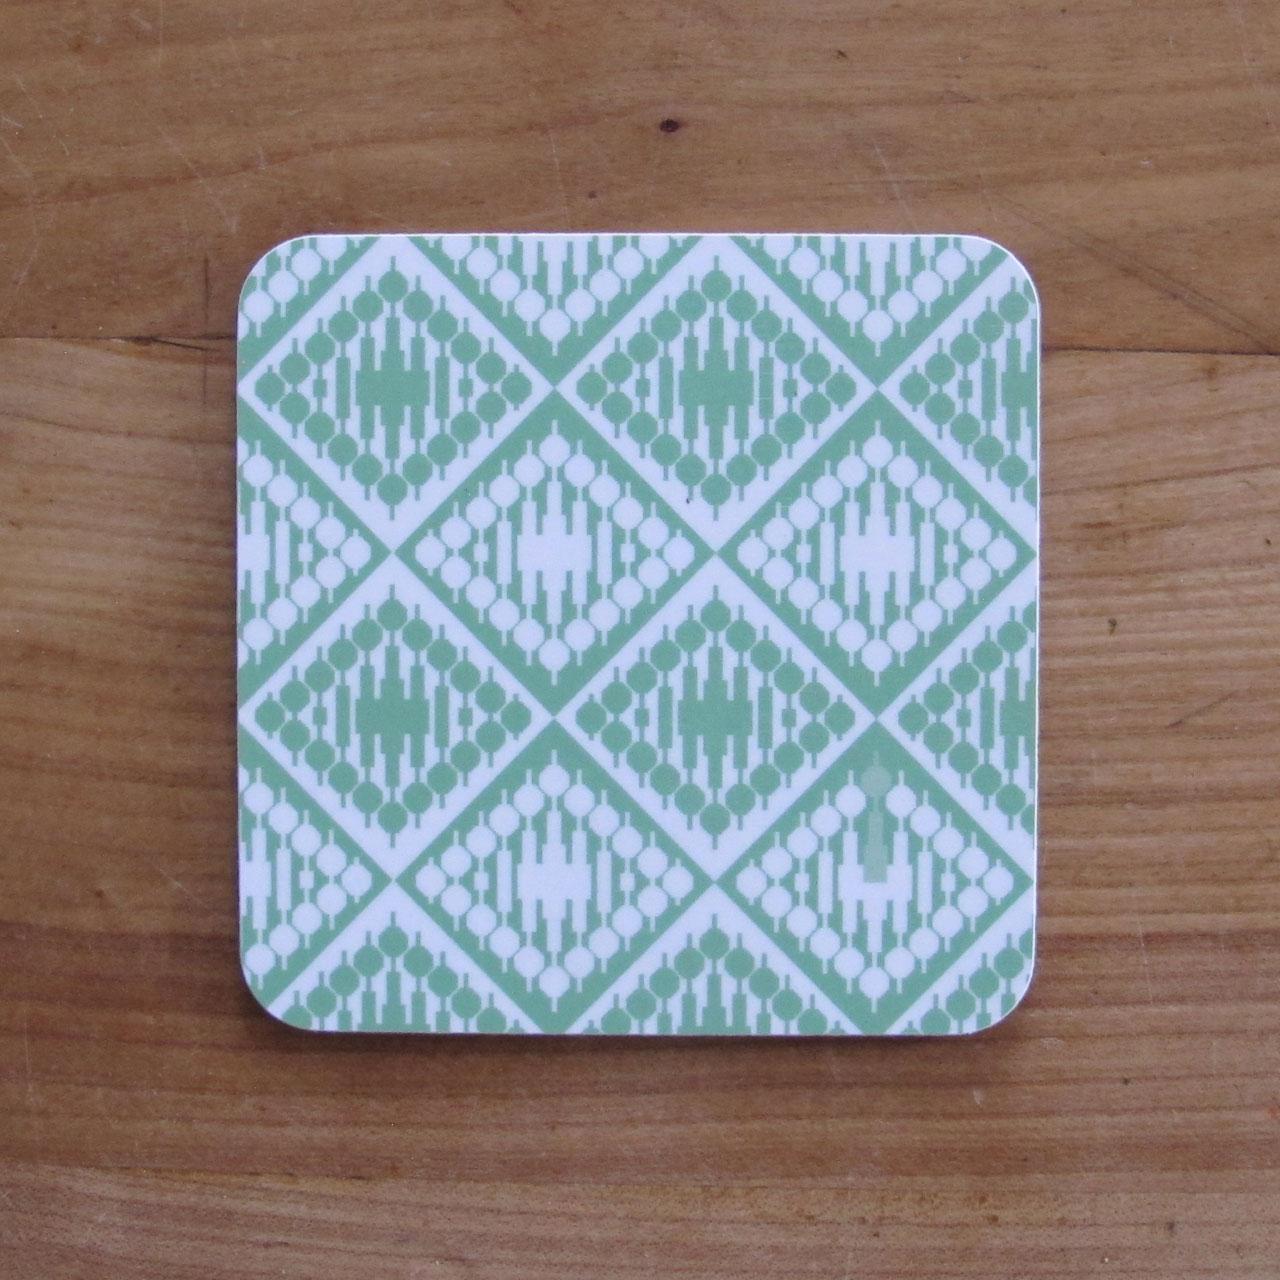 1x Coaster / Untersetzer Fernsehturm grün